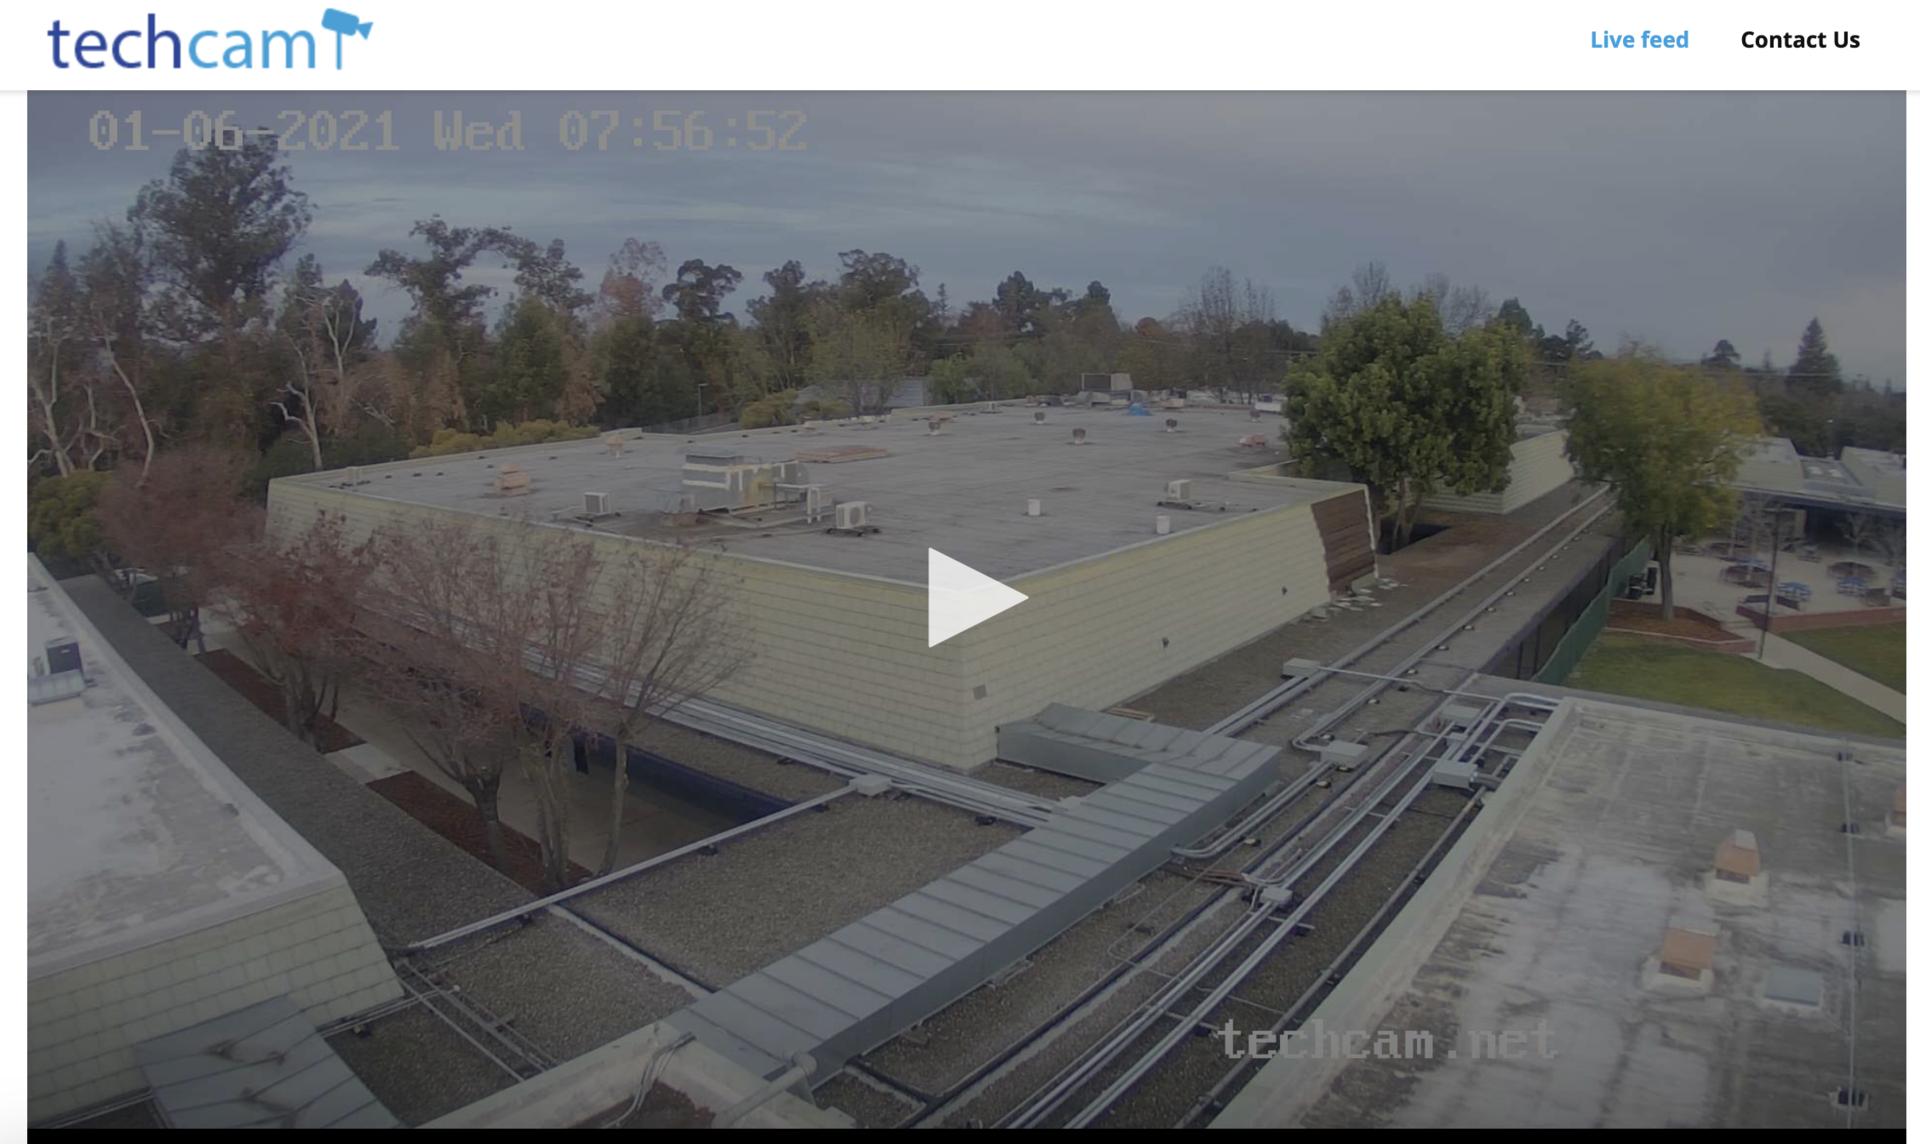 PHS Live Student Union Camera Feed